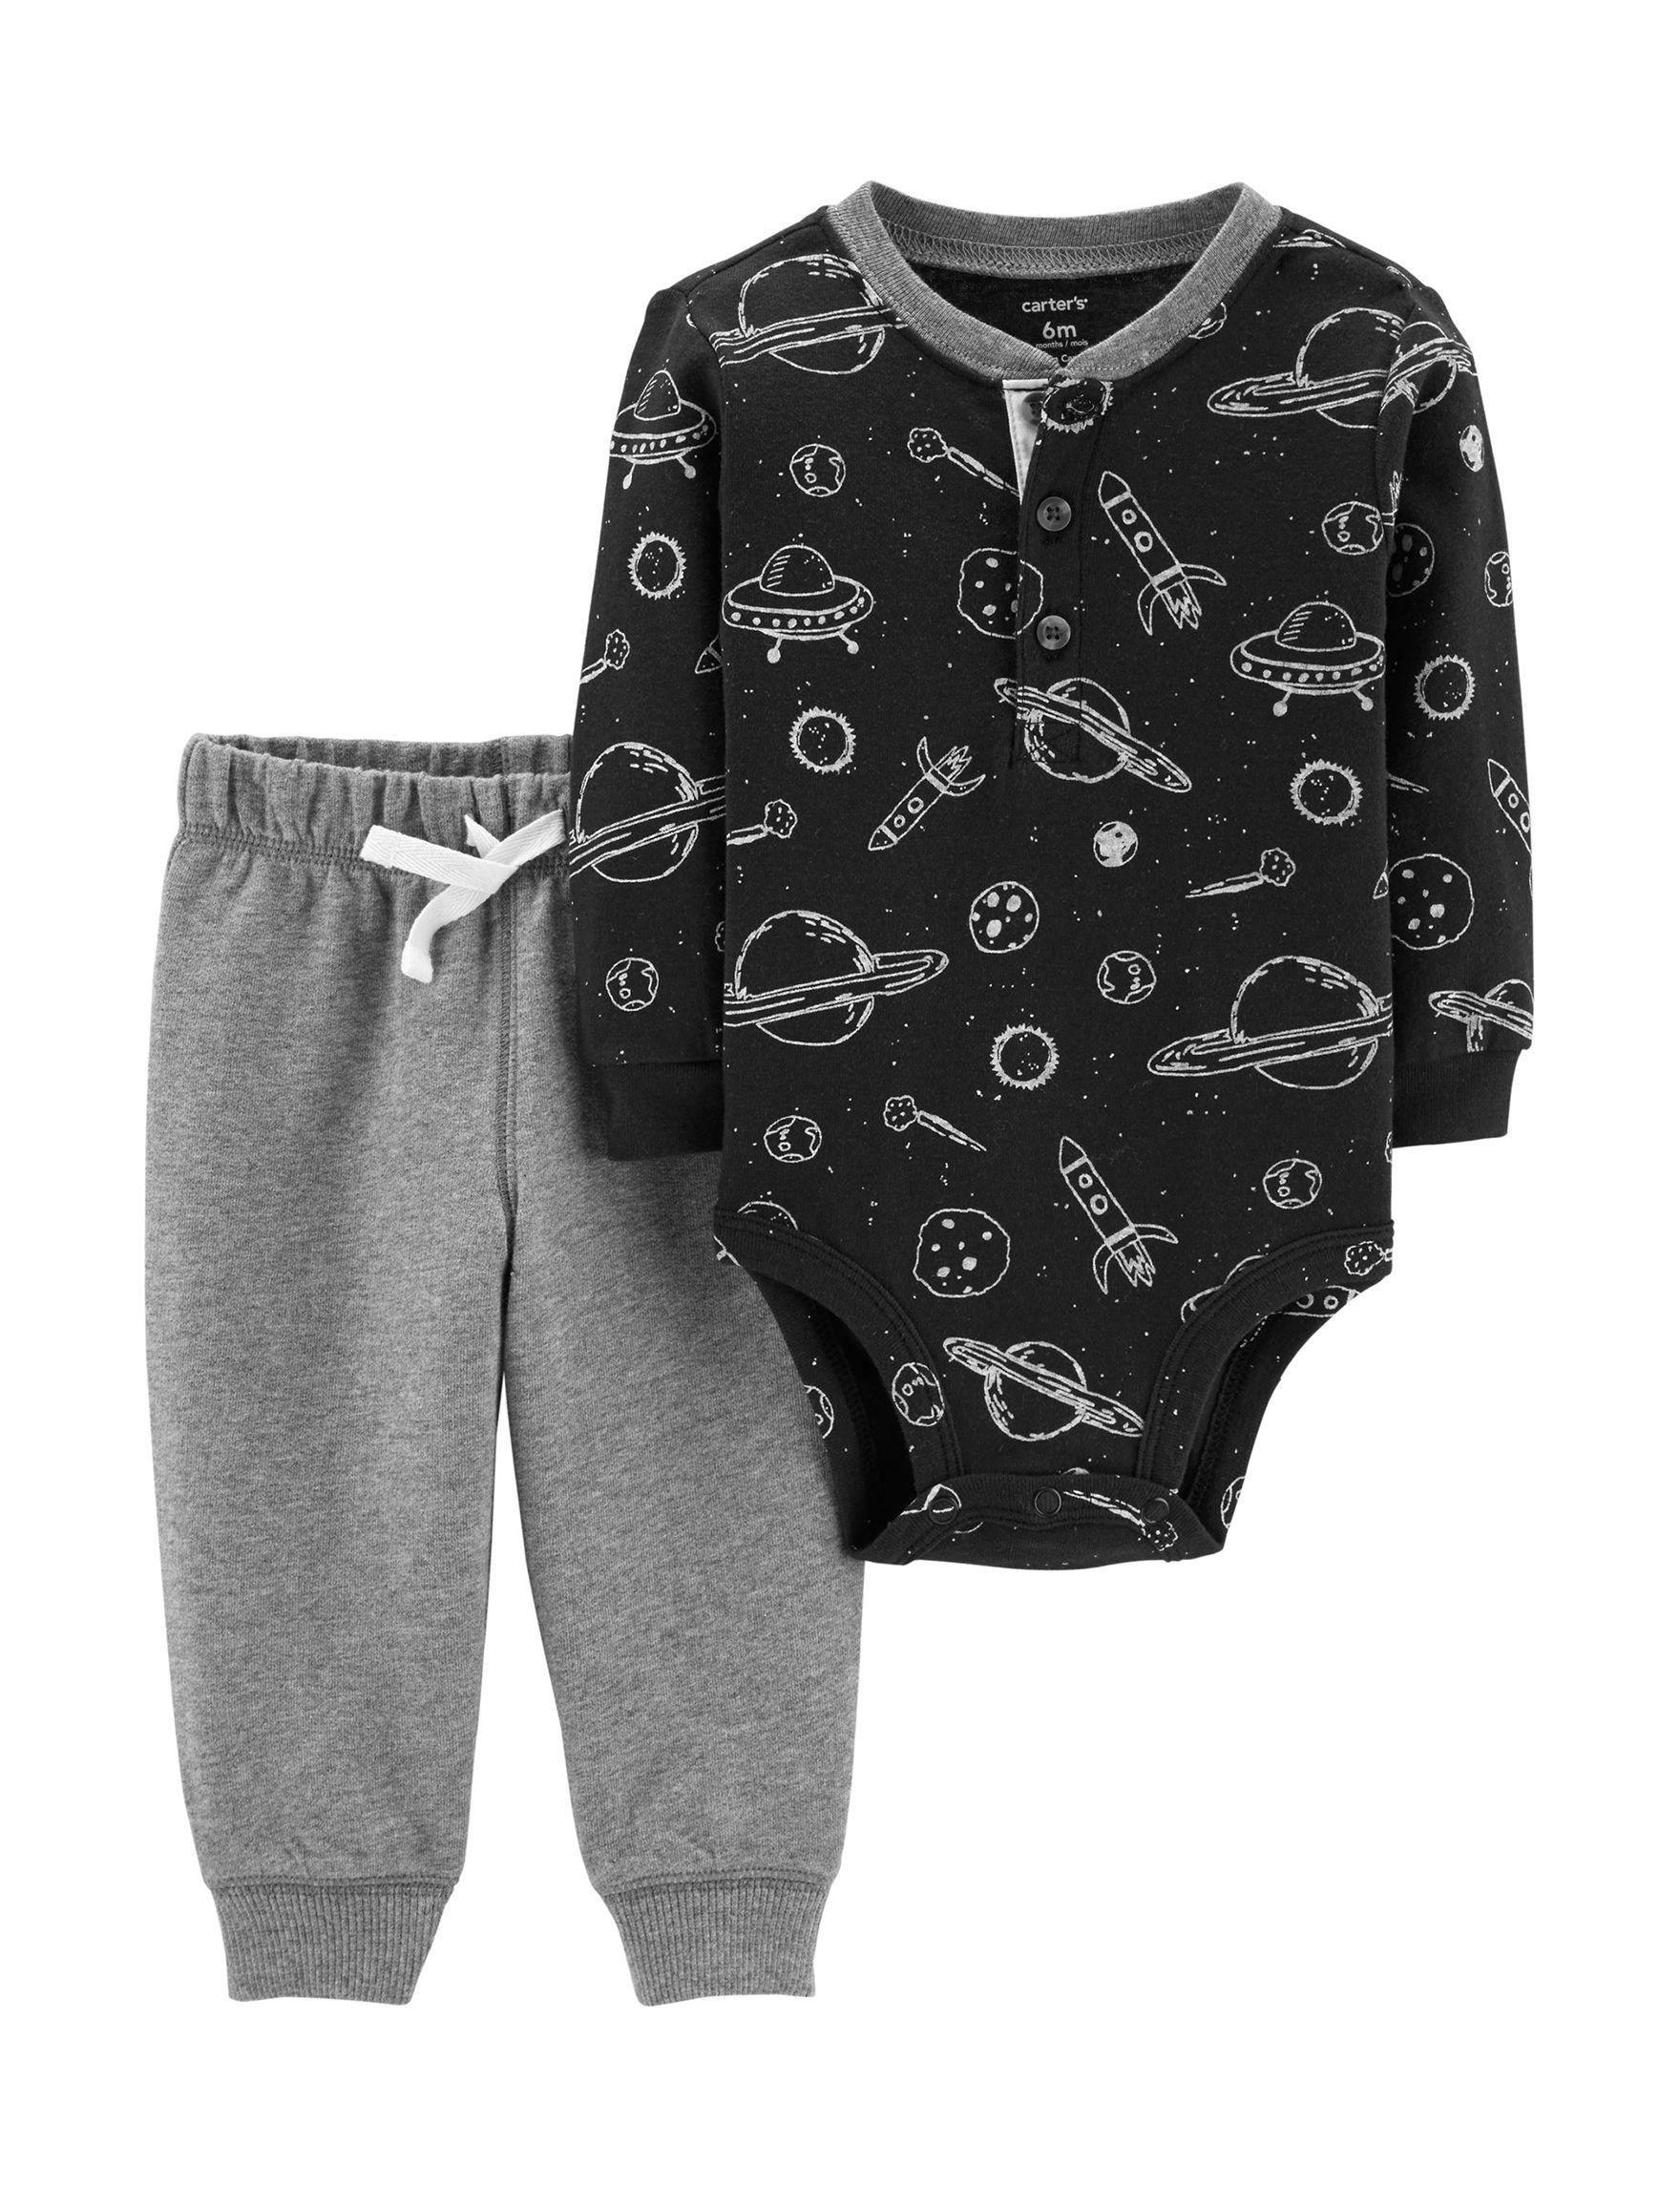 Carter's Black / Grey